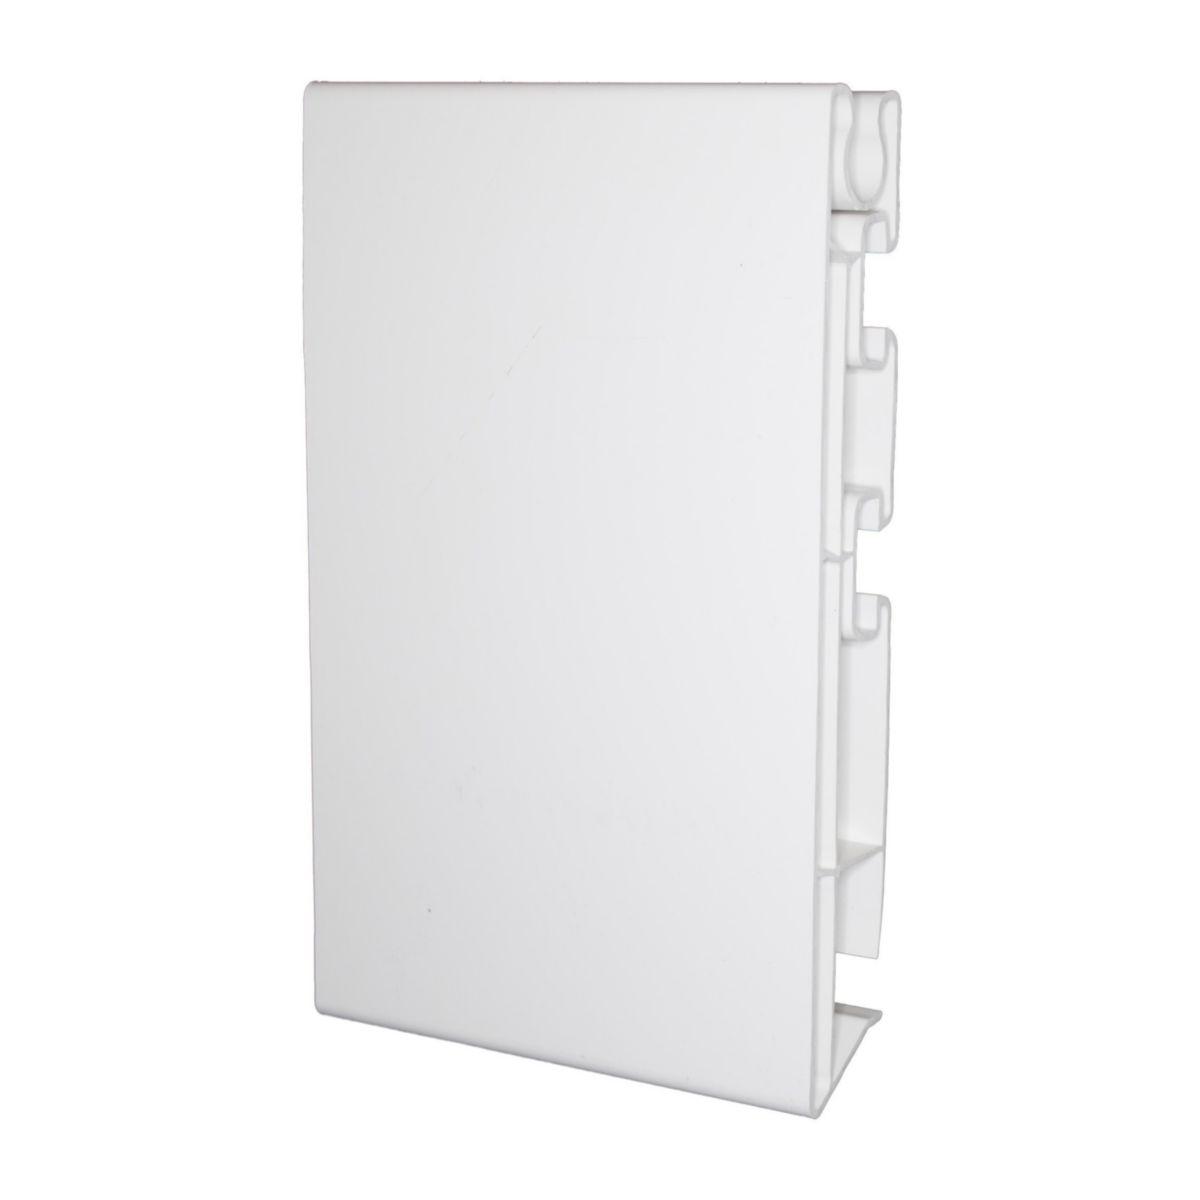 Mep Bandeau Pvc Blanc 25x160x4000mm Point P